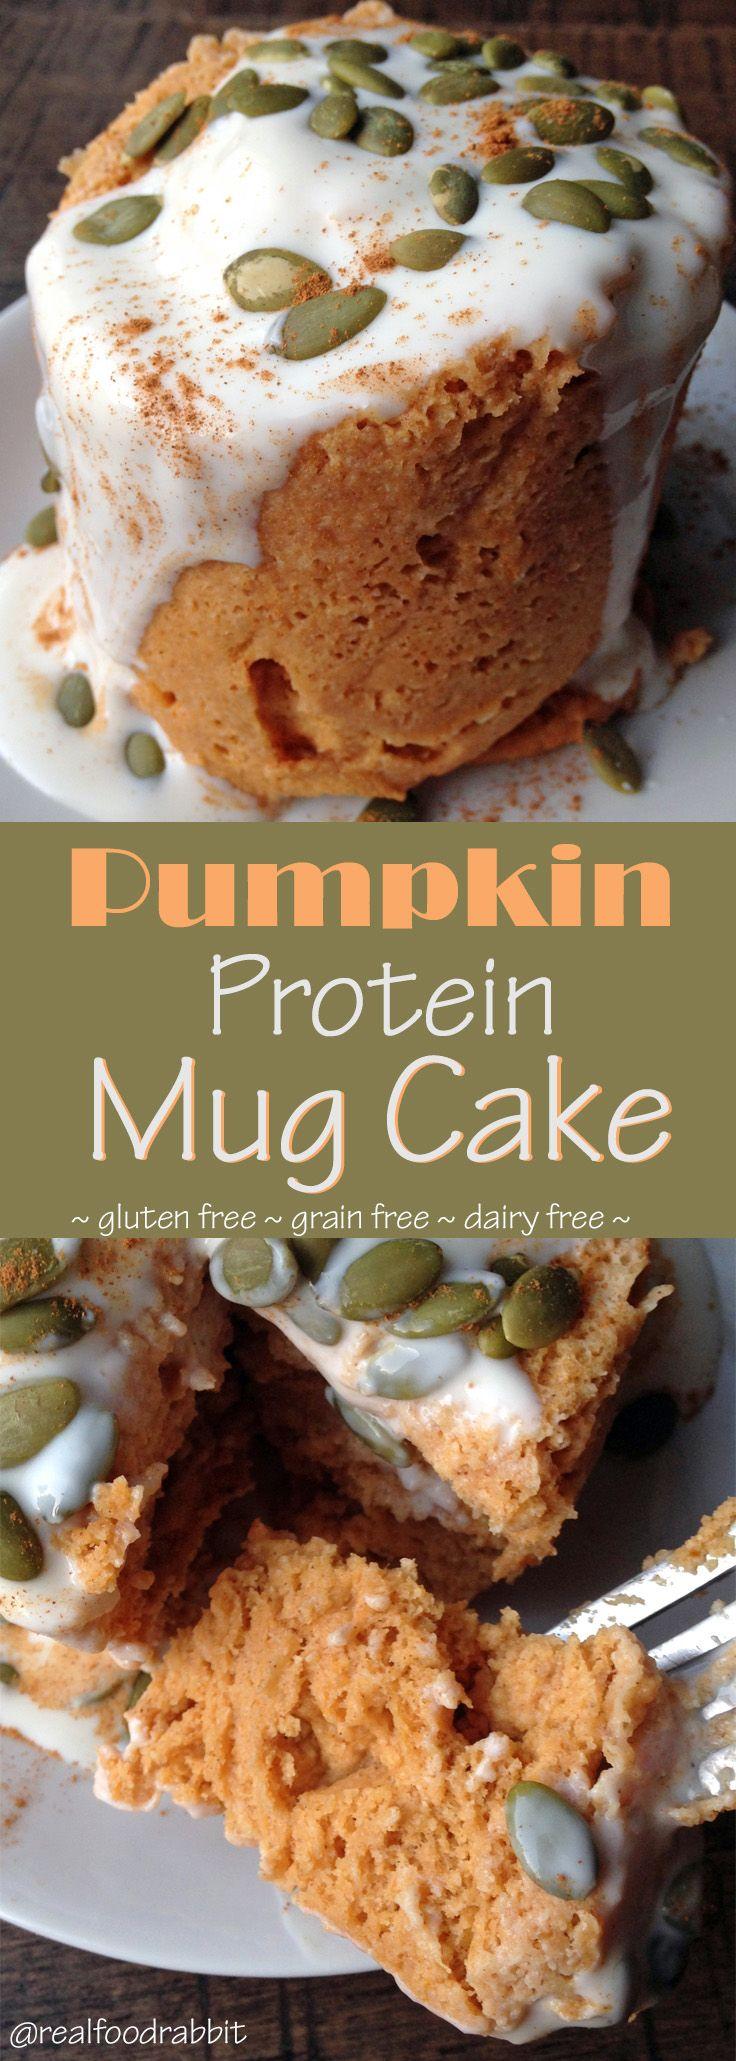 Pumpkin Mug Cake   Mug recipes, Protein mug cakes, Baking ...